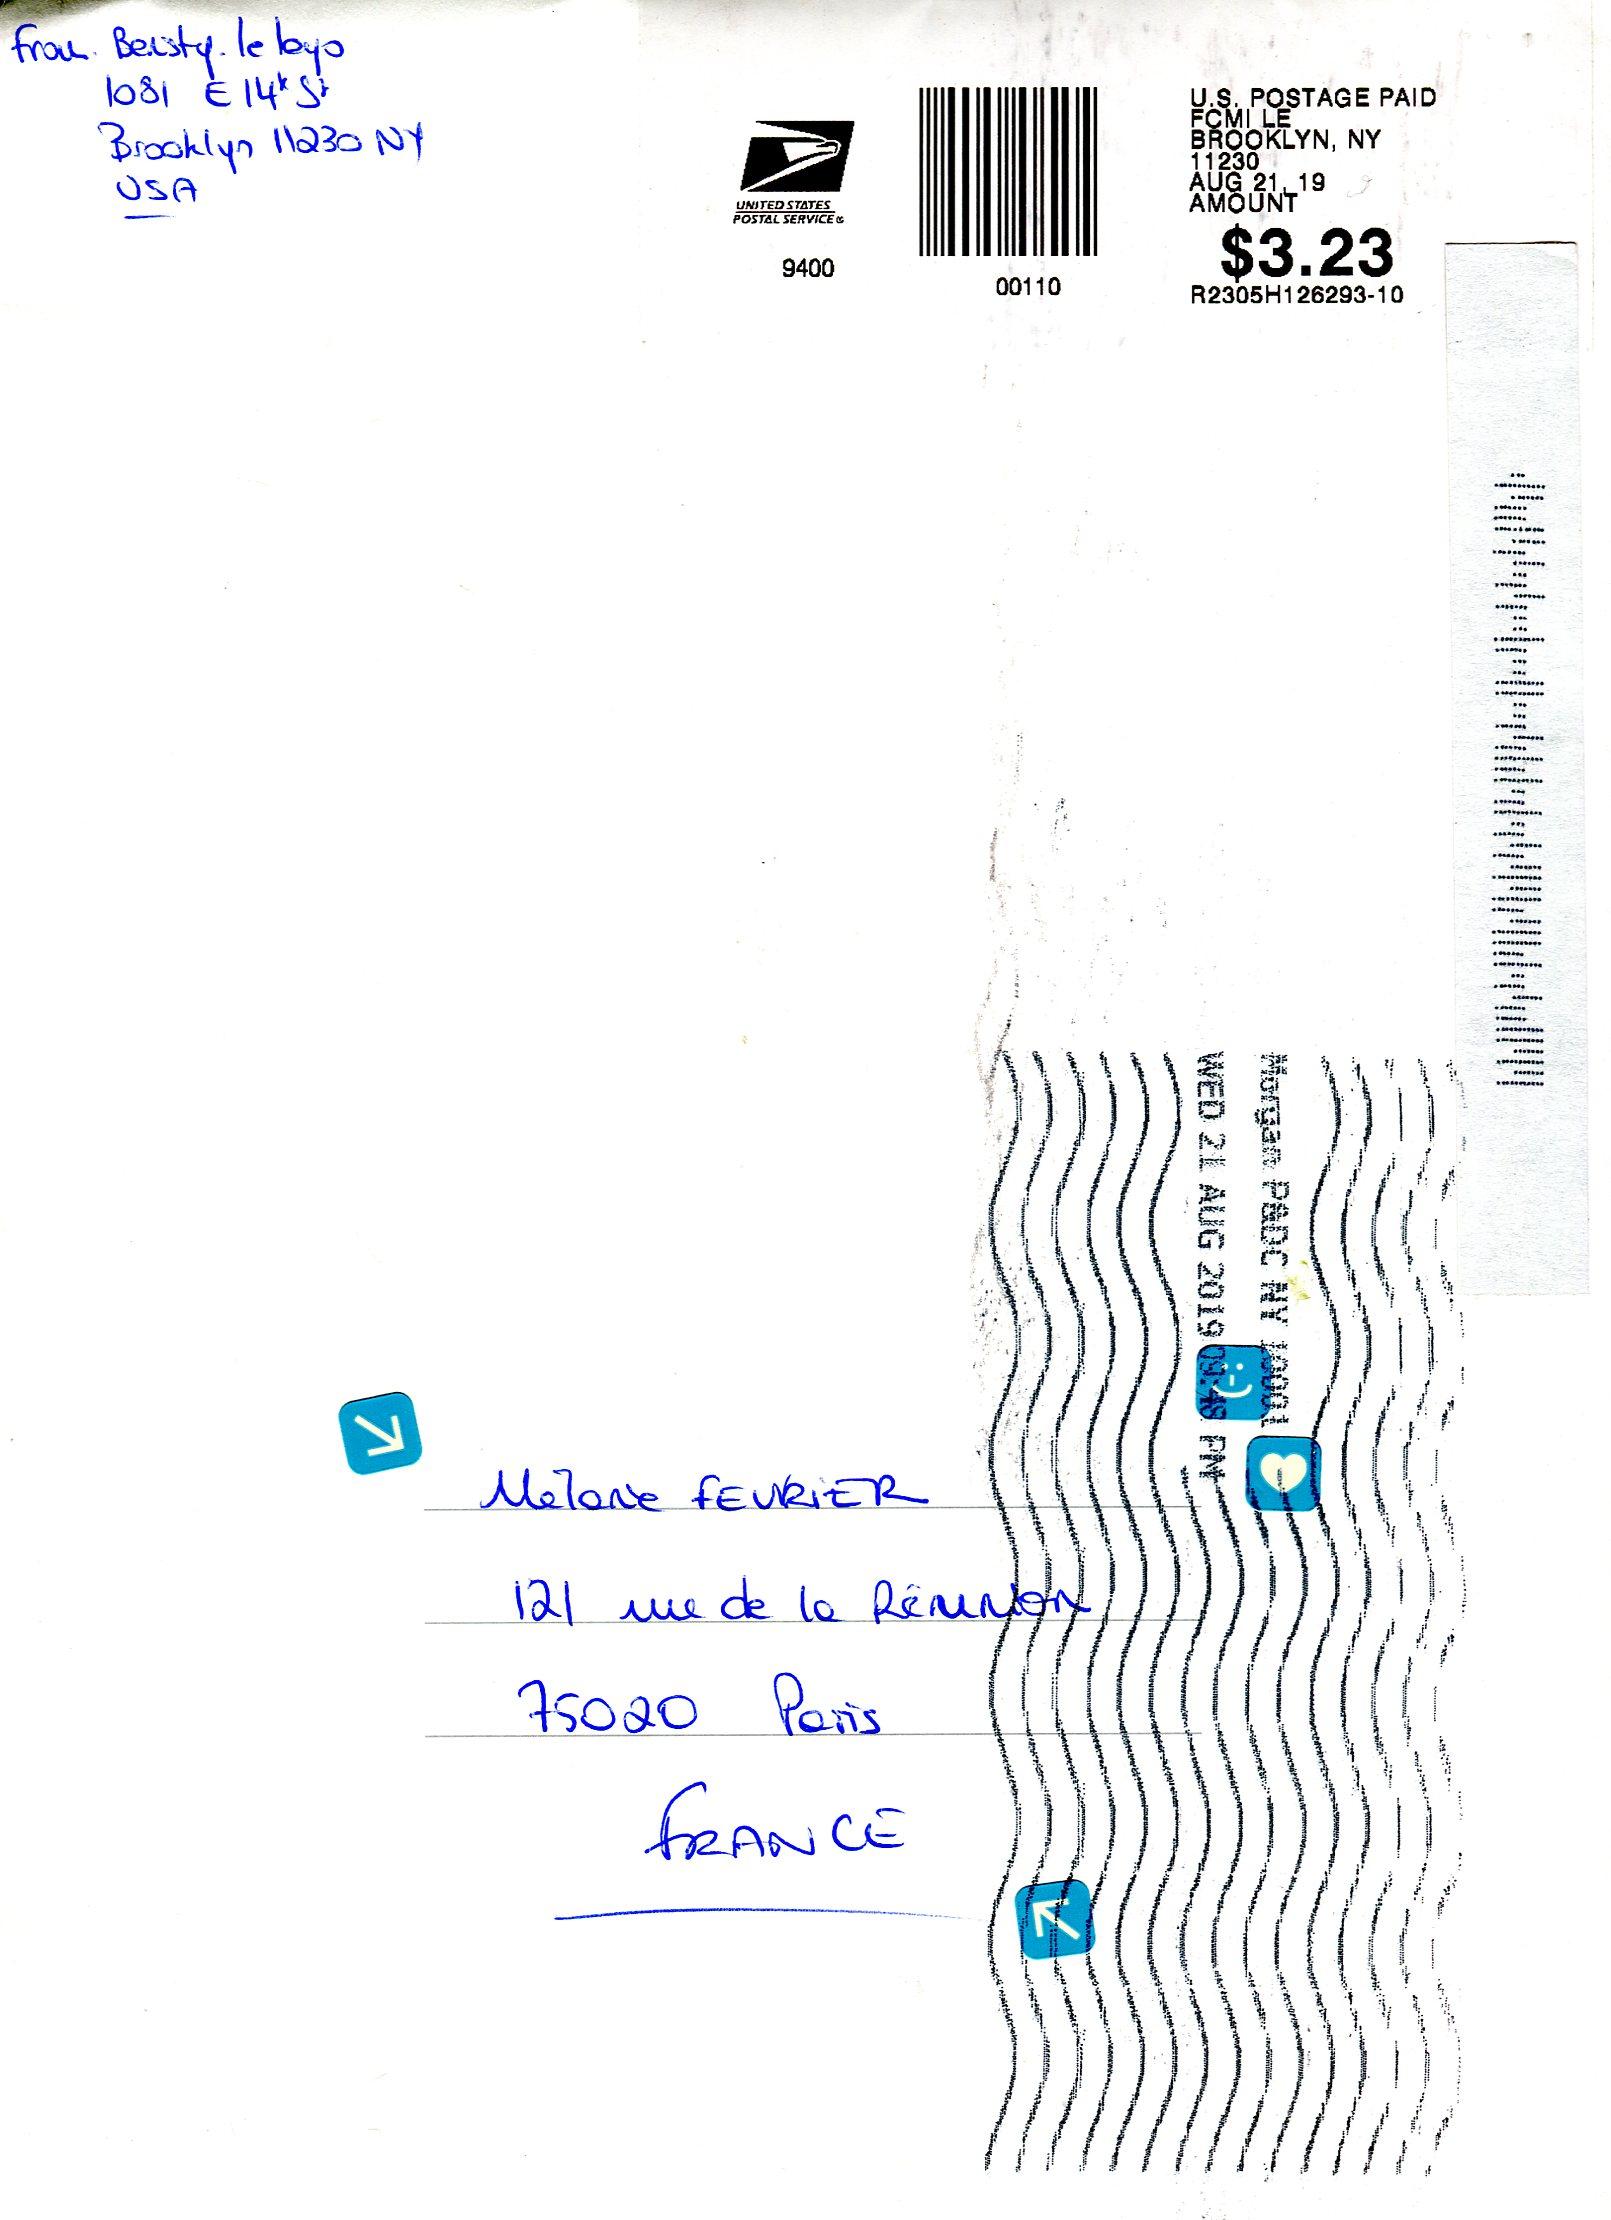 enveloppe006